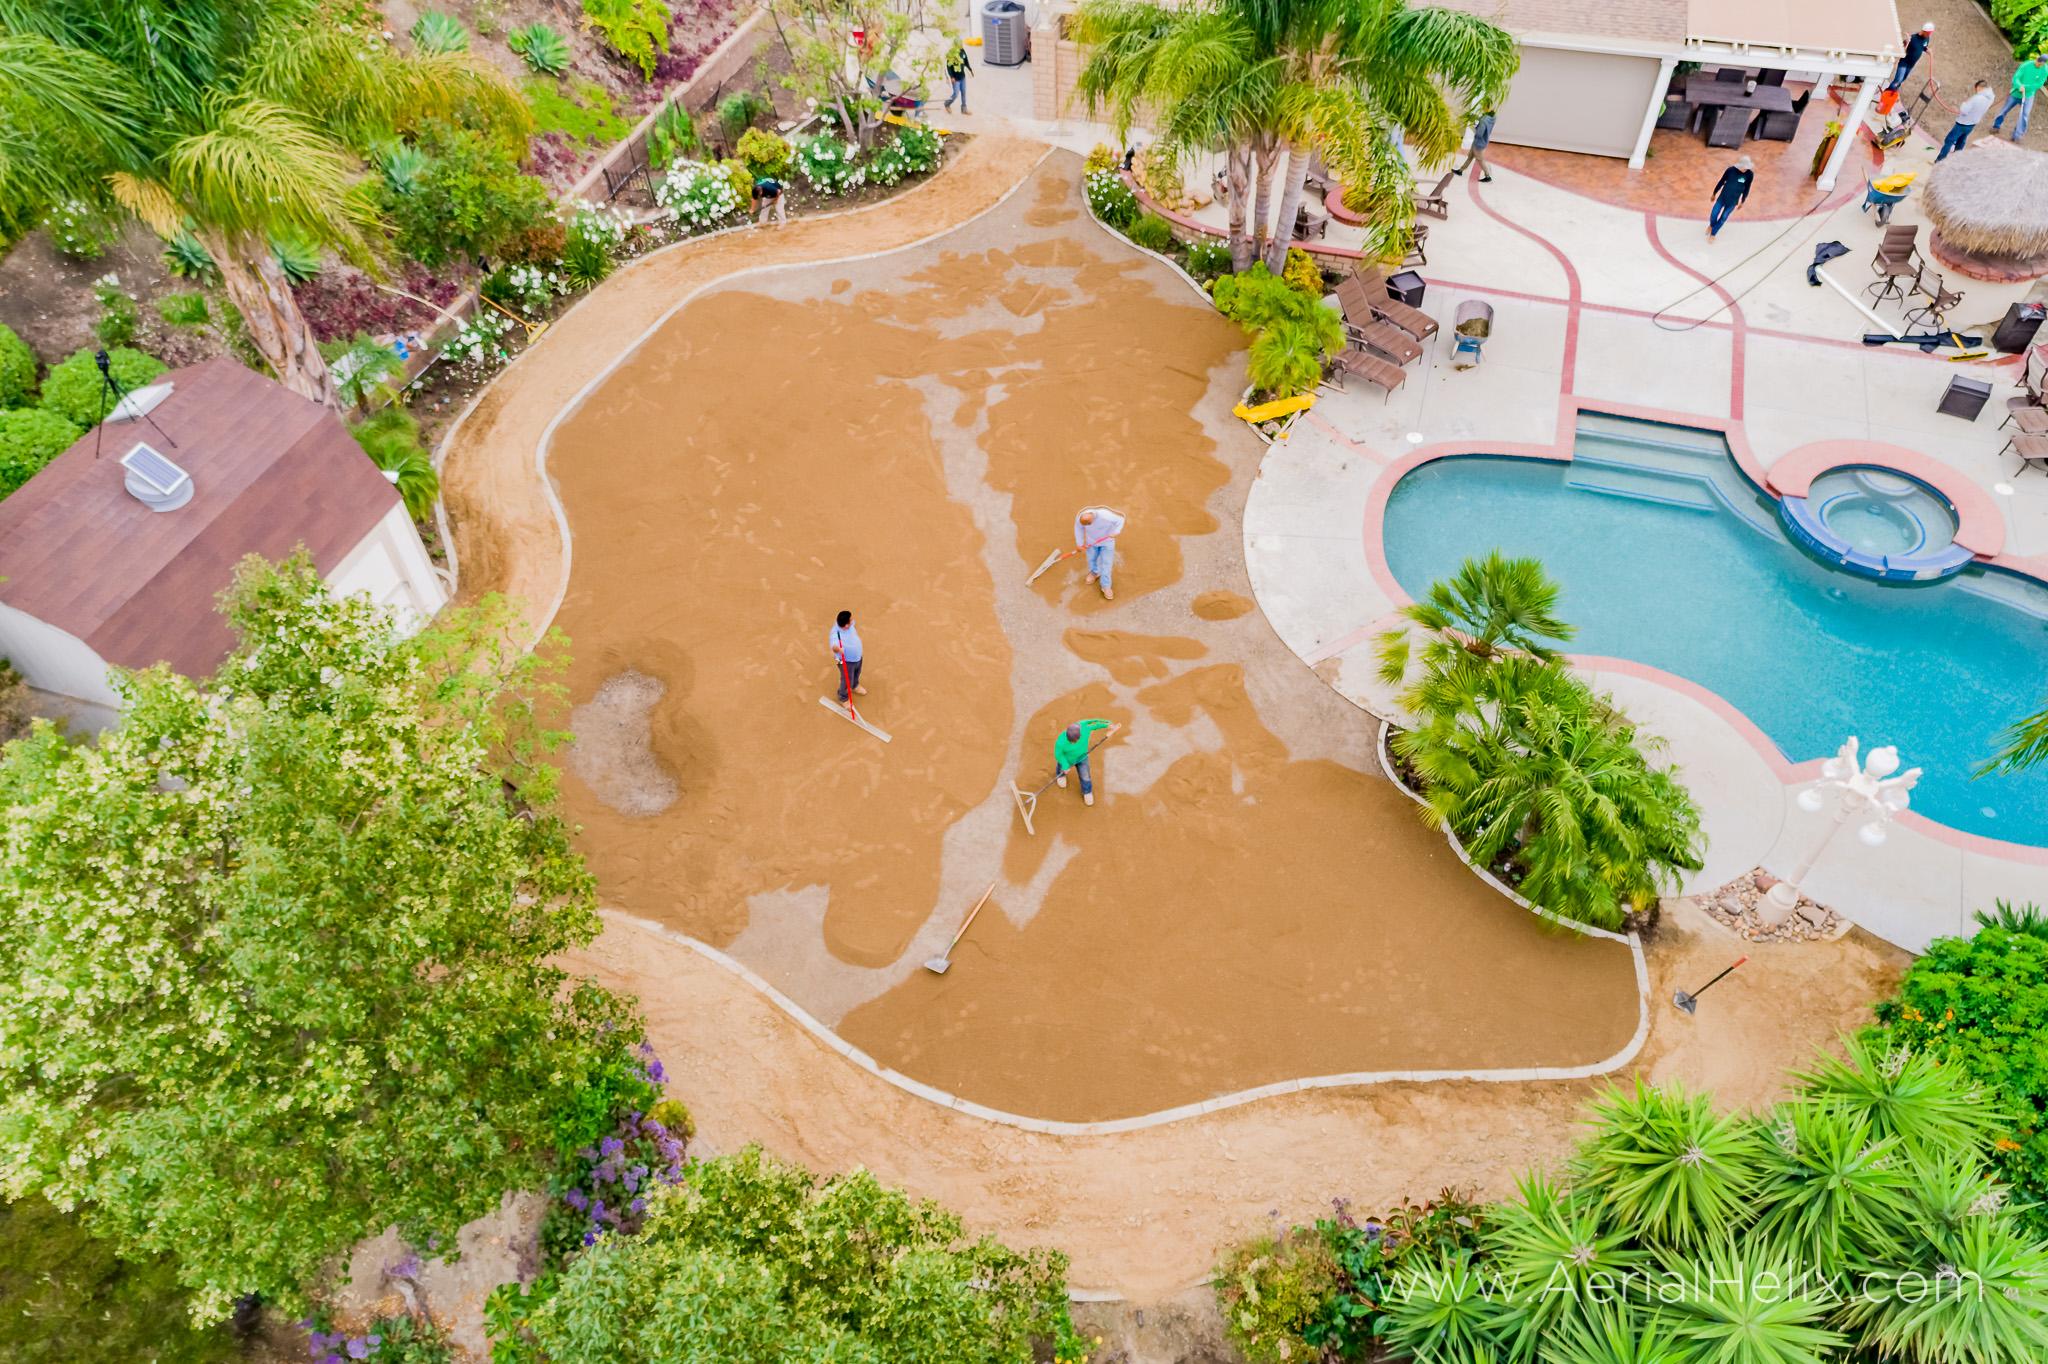 Joe Grass Install Photos aerial-16.jpg